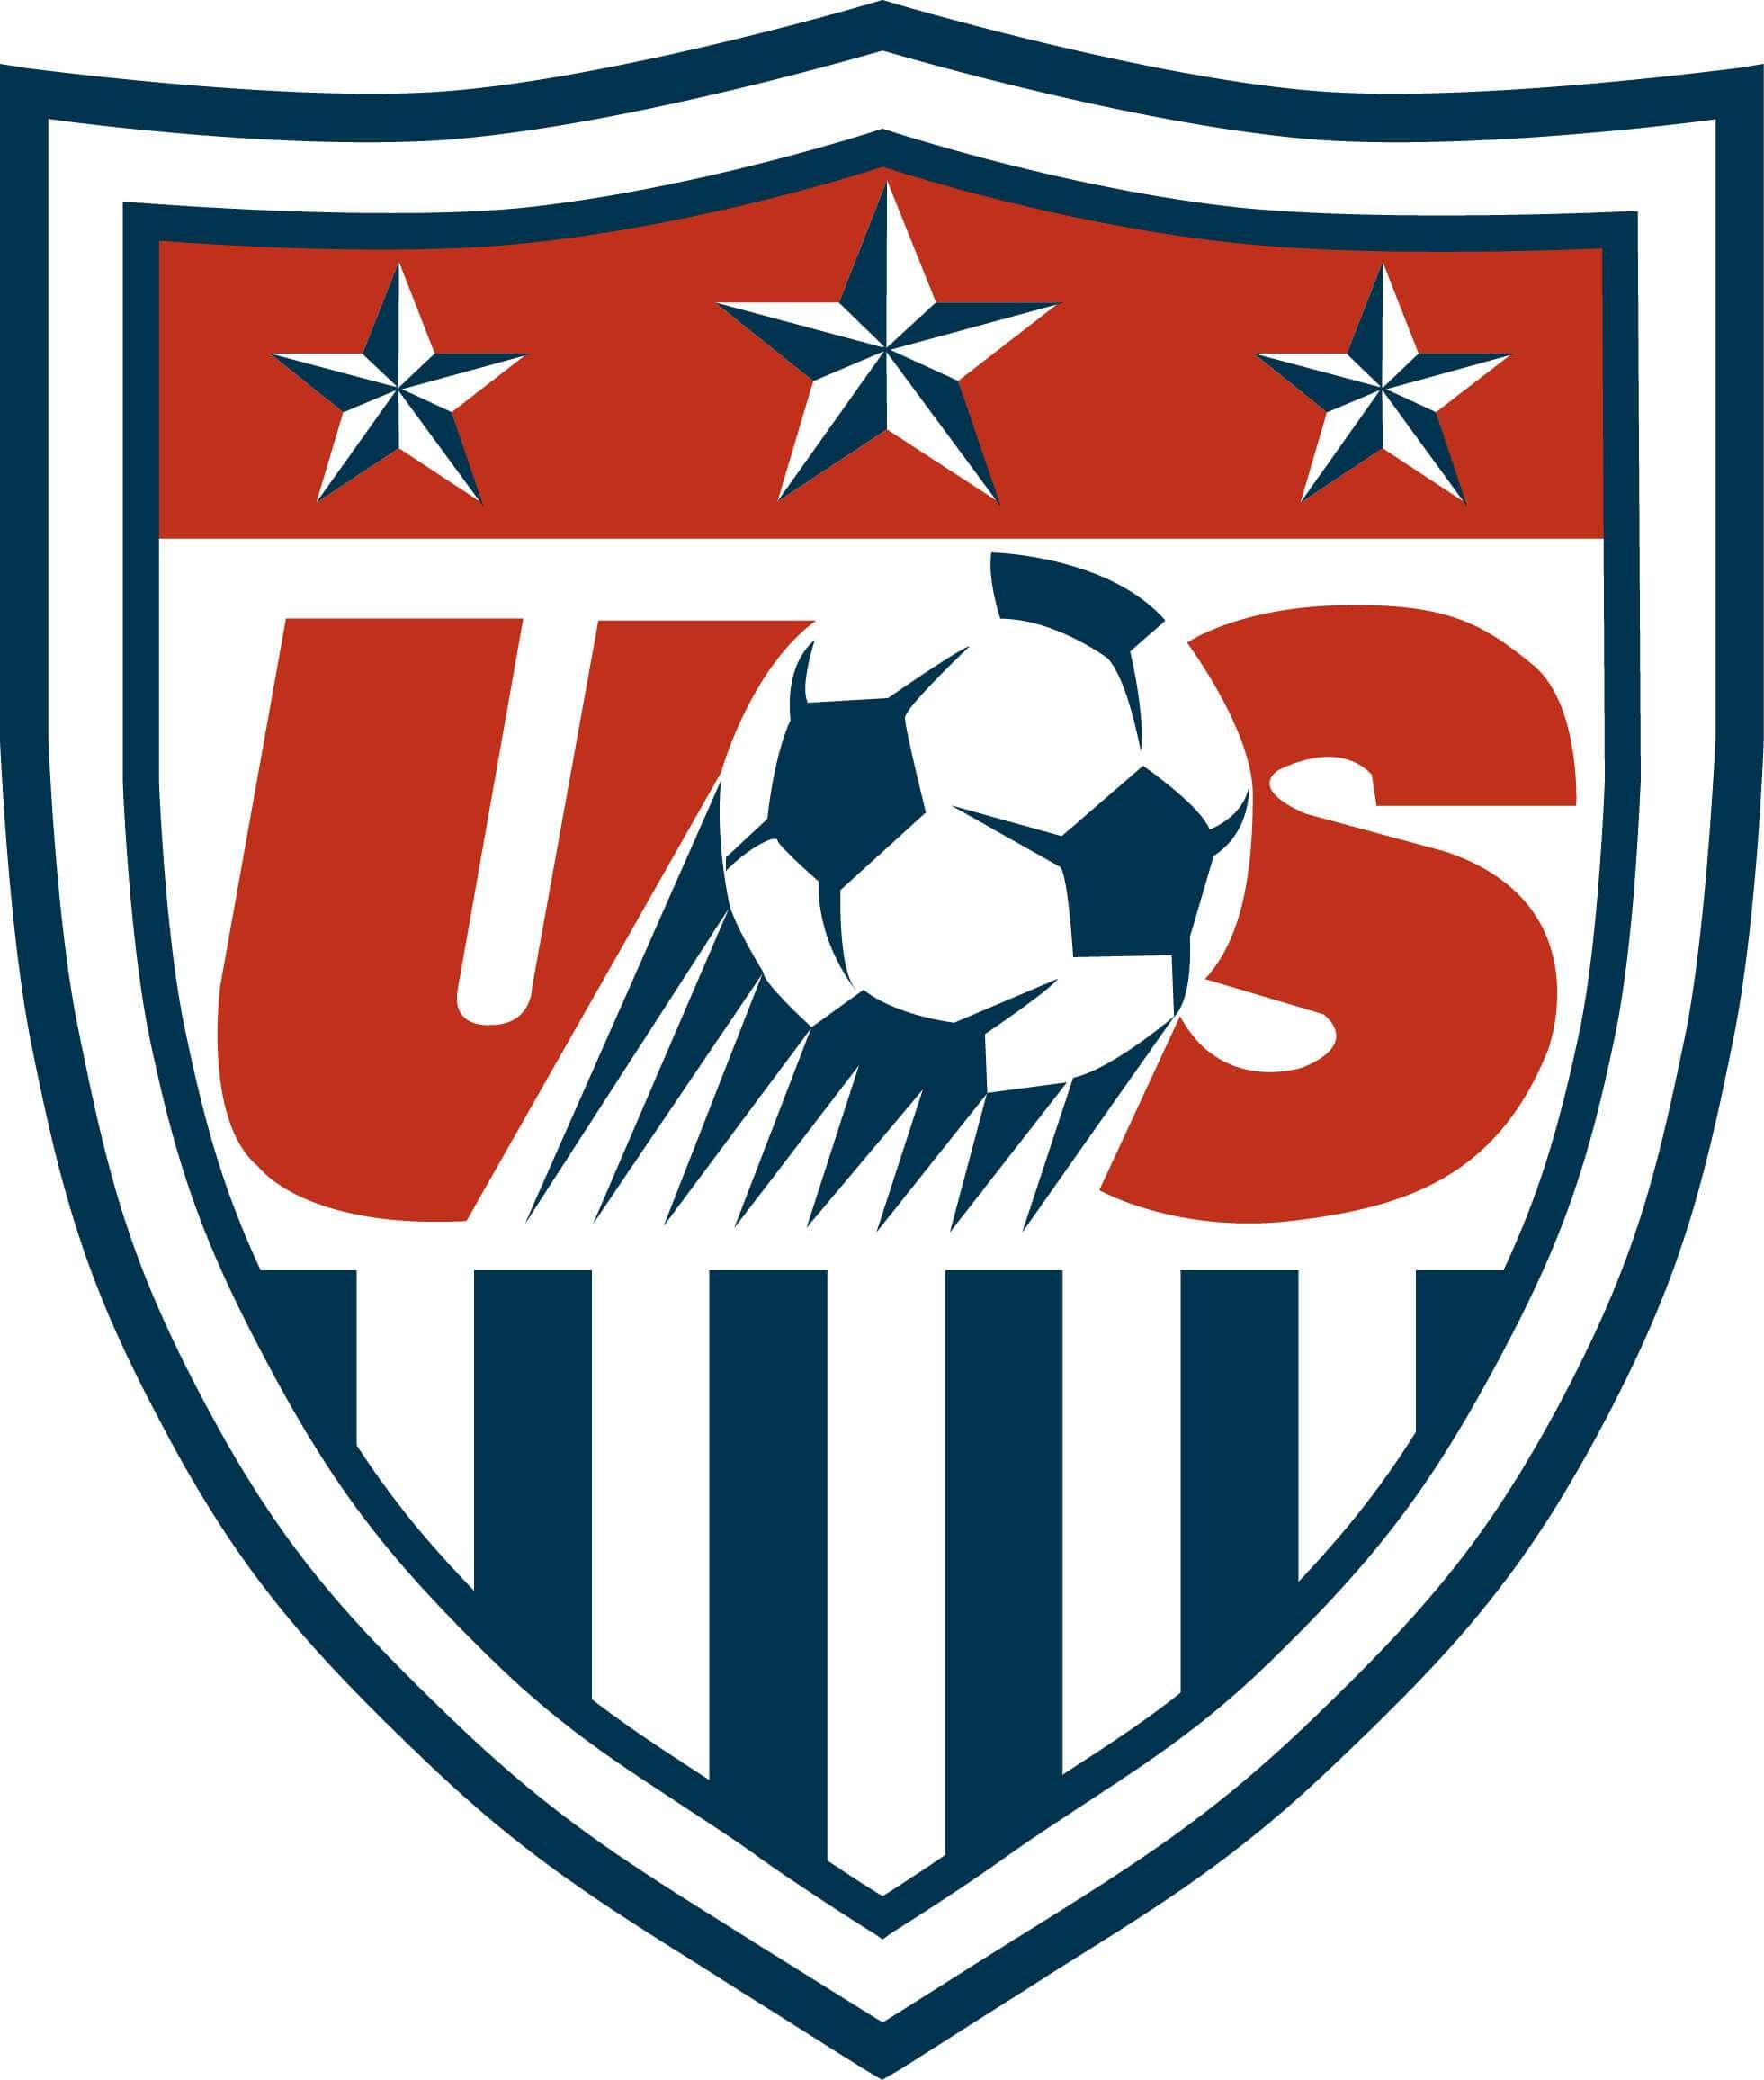 United States Soccer Federation & United States National Soccer Team Logo [ussoccer.com] png